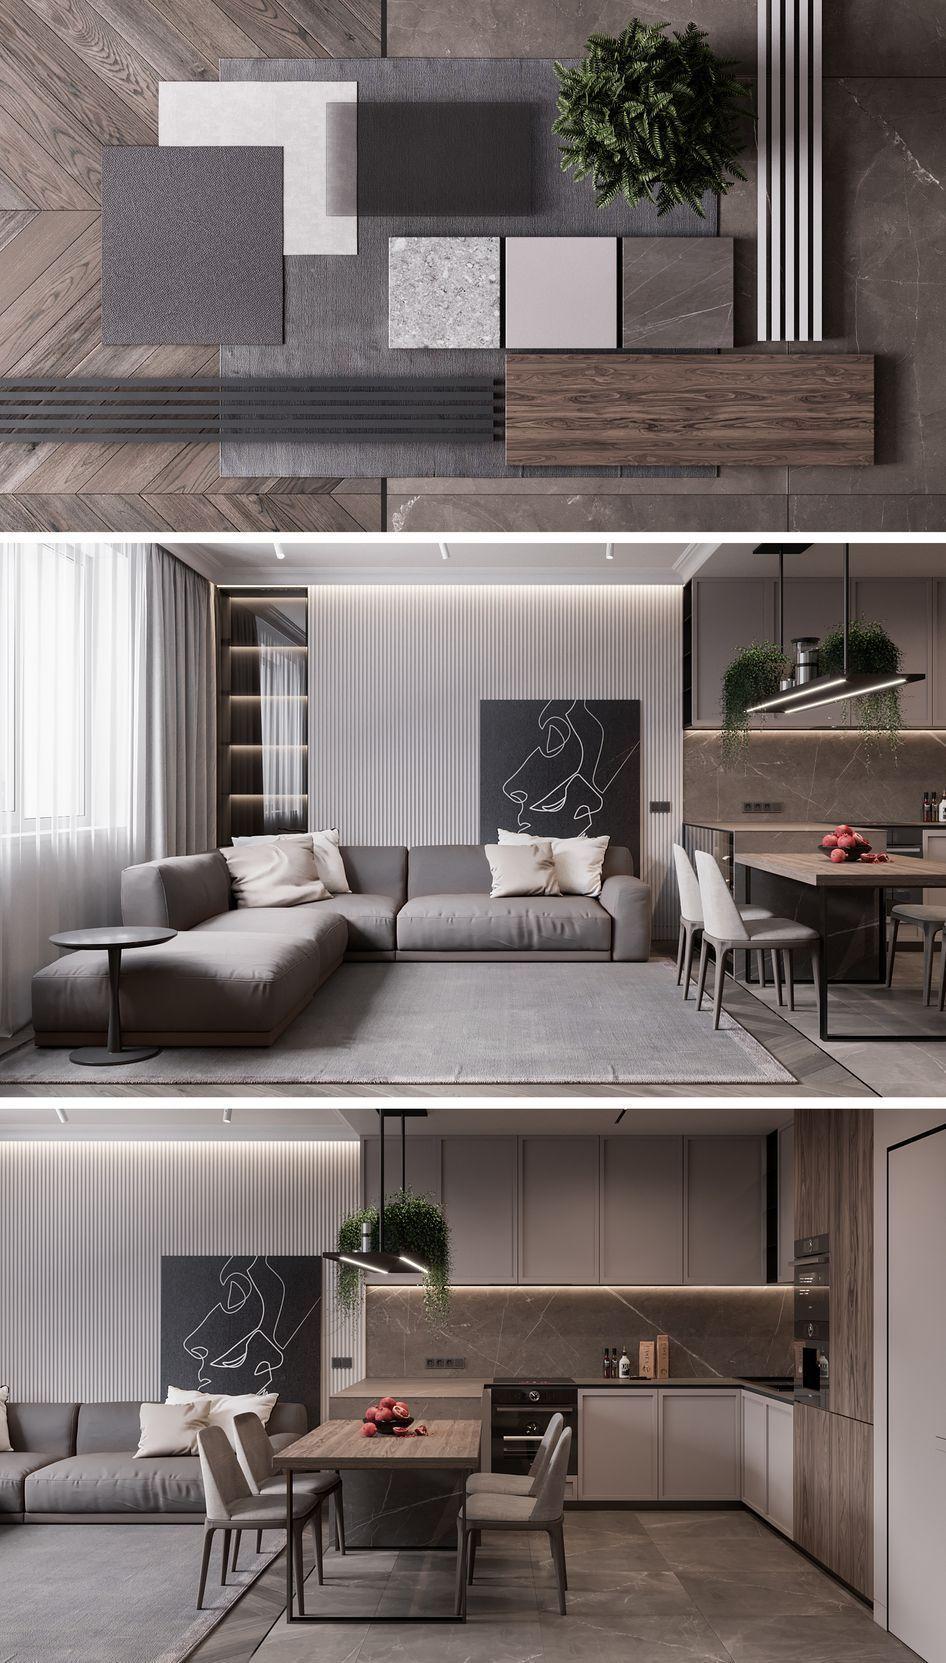 31 Unordinary Interior Design Trends Ideas 2018 Living Design Apartment Design Apartment Interior